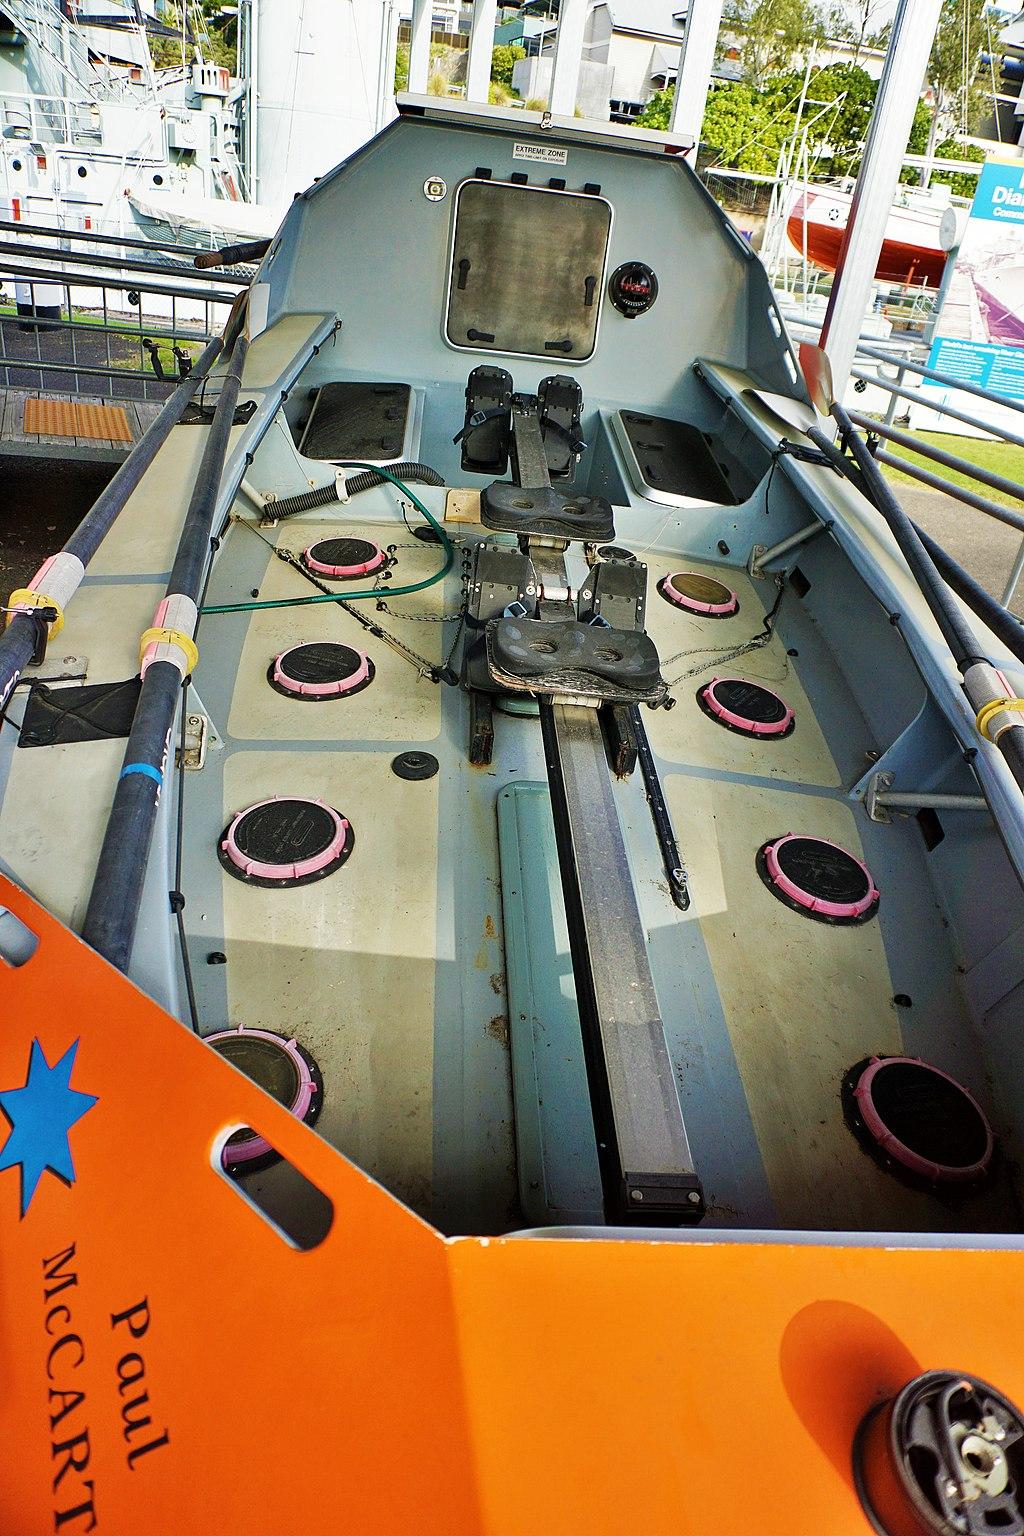 Queensland Maritime Museum - Joy of Museums - Freedom - Atlantic Rowing Race Boat 2